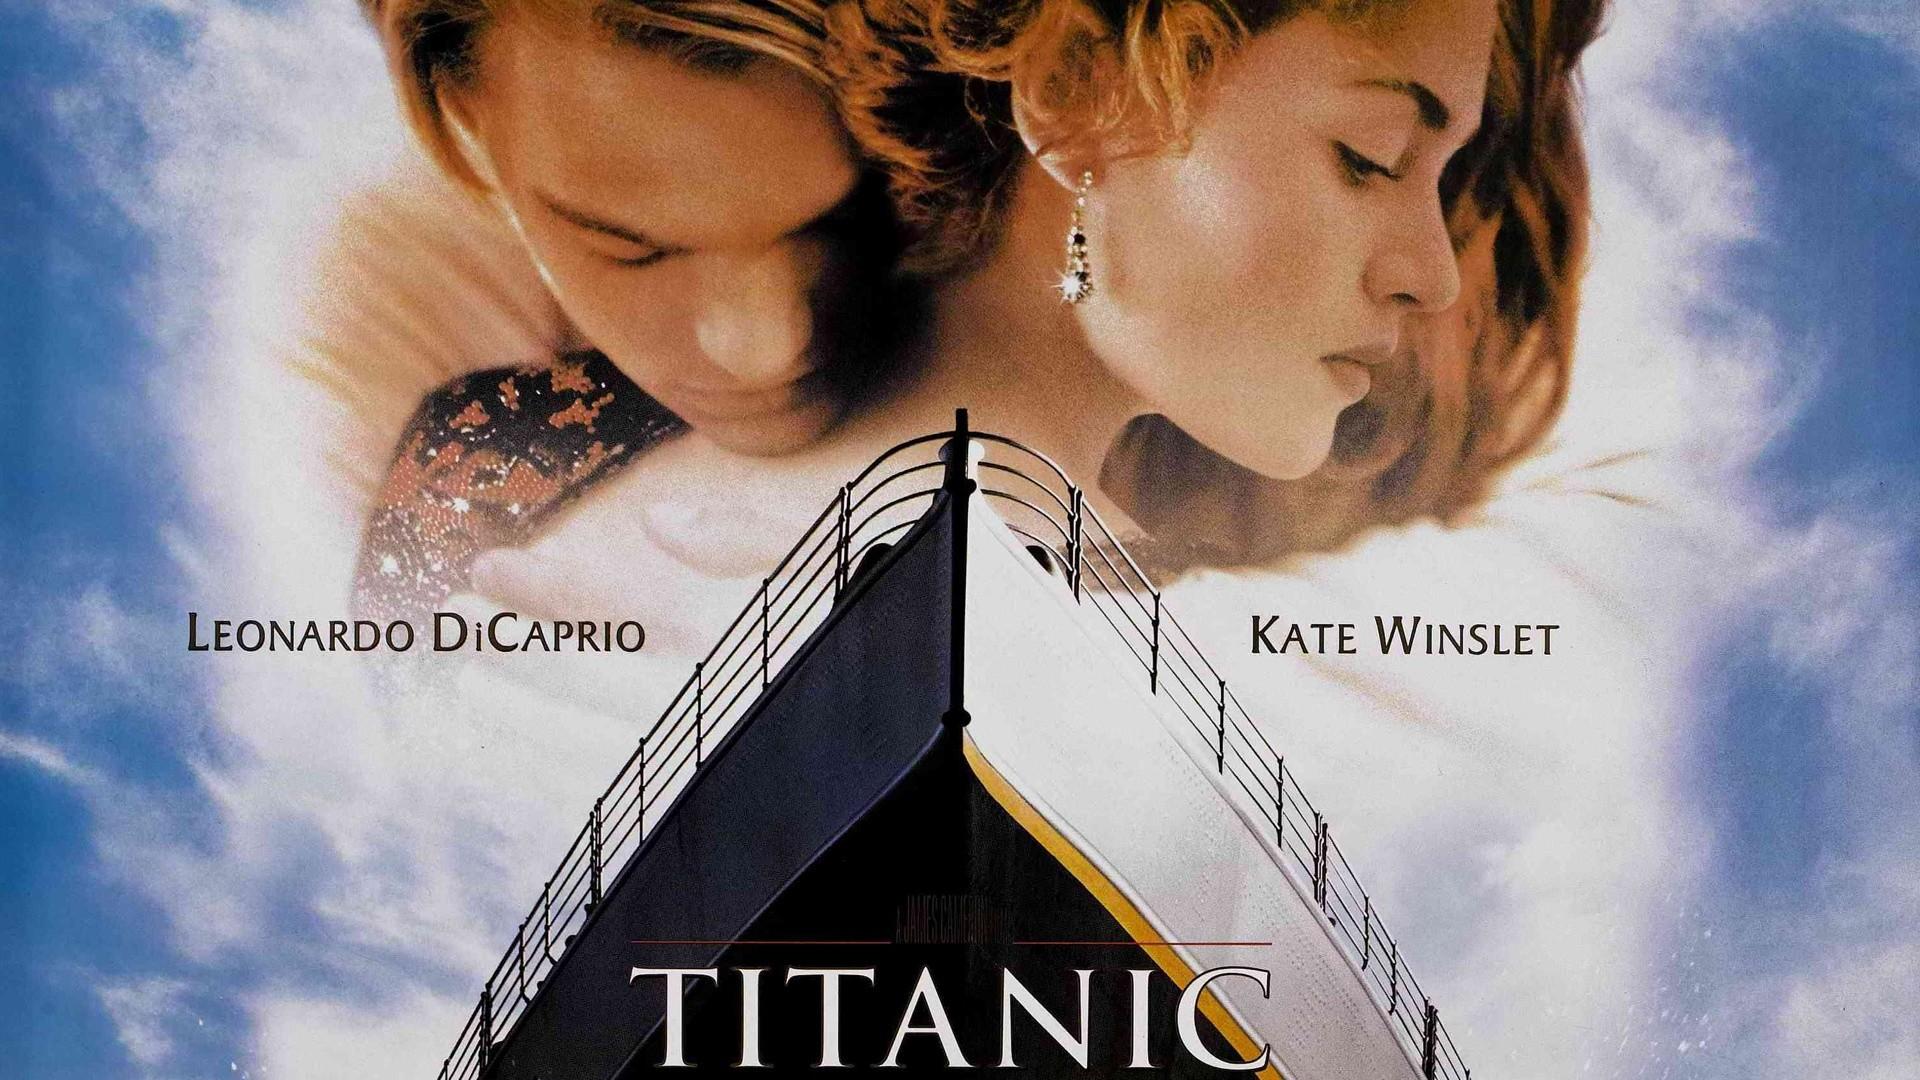 Description: Download Titanic Movie HD & Widescreen Movies Wallpaper from